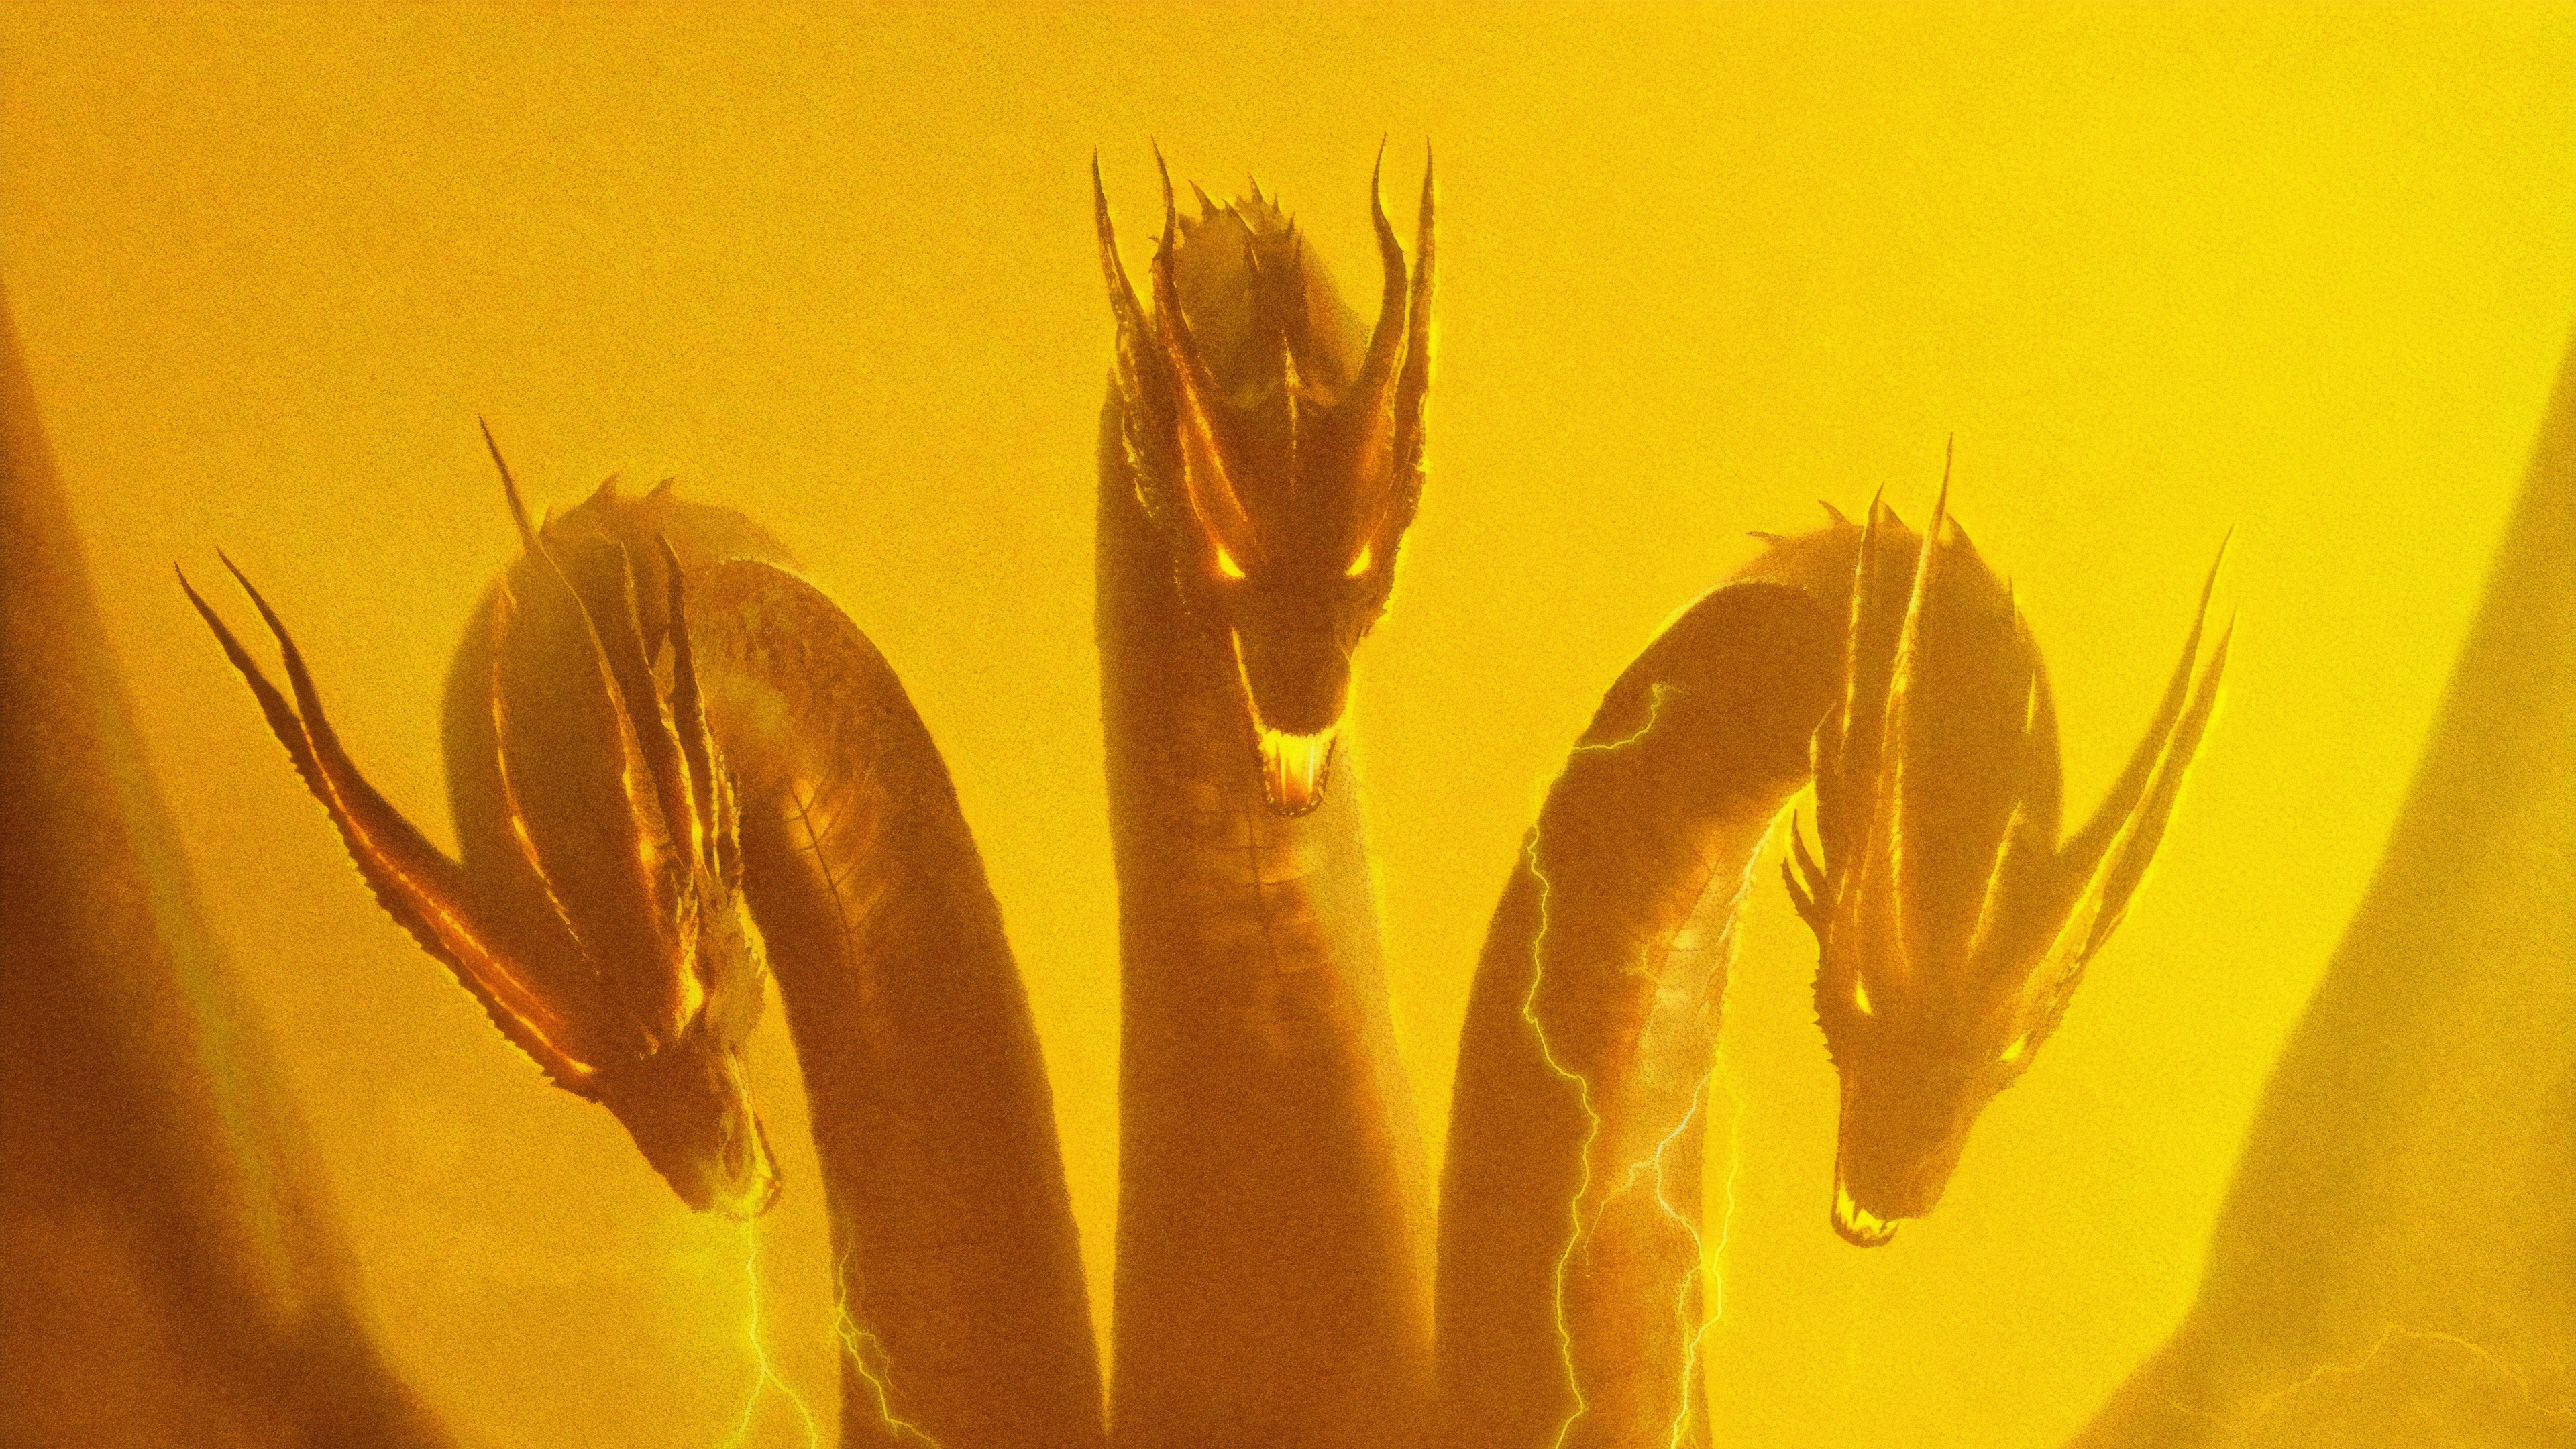 ghidorah godzilla king of the monsters 4k 1545589856 - Ghidorah Godzilla King Of The Monsters 4k - poster wallpapers, movies wallpapers, hd-wallpapers, godzilla king of the monsters wallpapers, 5k wallpapers, 4k-wallpapers, 2019 movies wallpapers